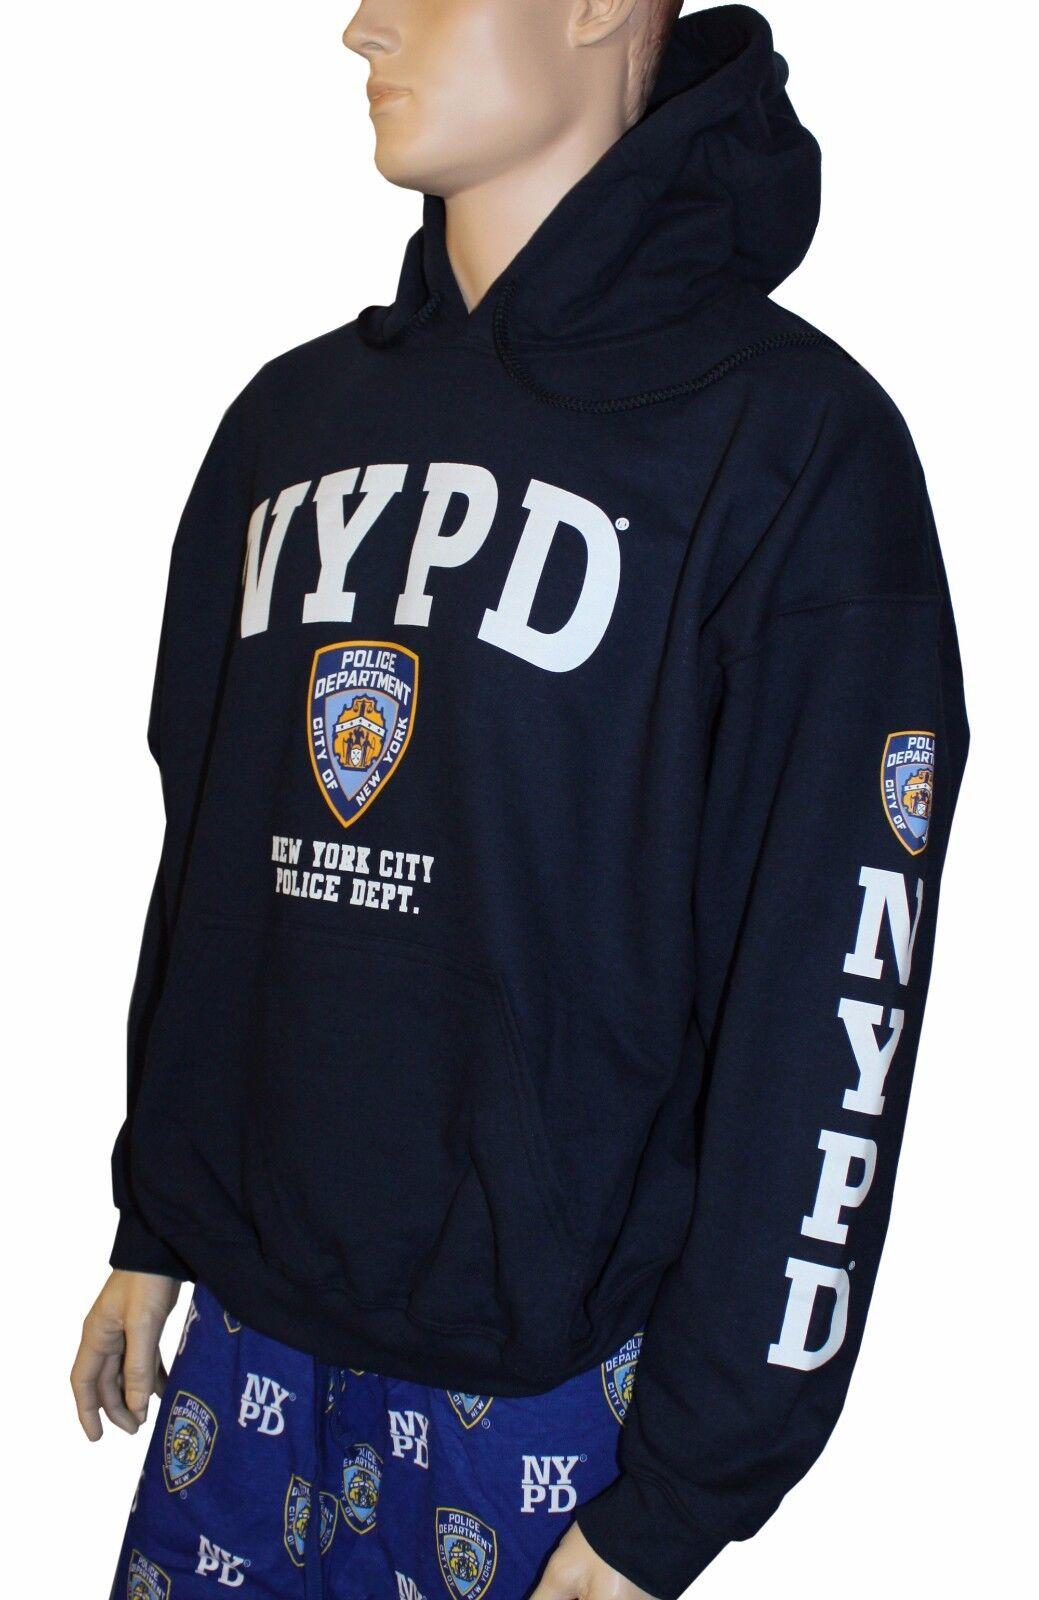 NYPD NAVY NEW YORK POLICE DEPARTMENT HOODIE Weiß LOGO SLEEVE COPS MEN UNISEX